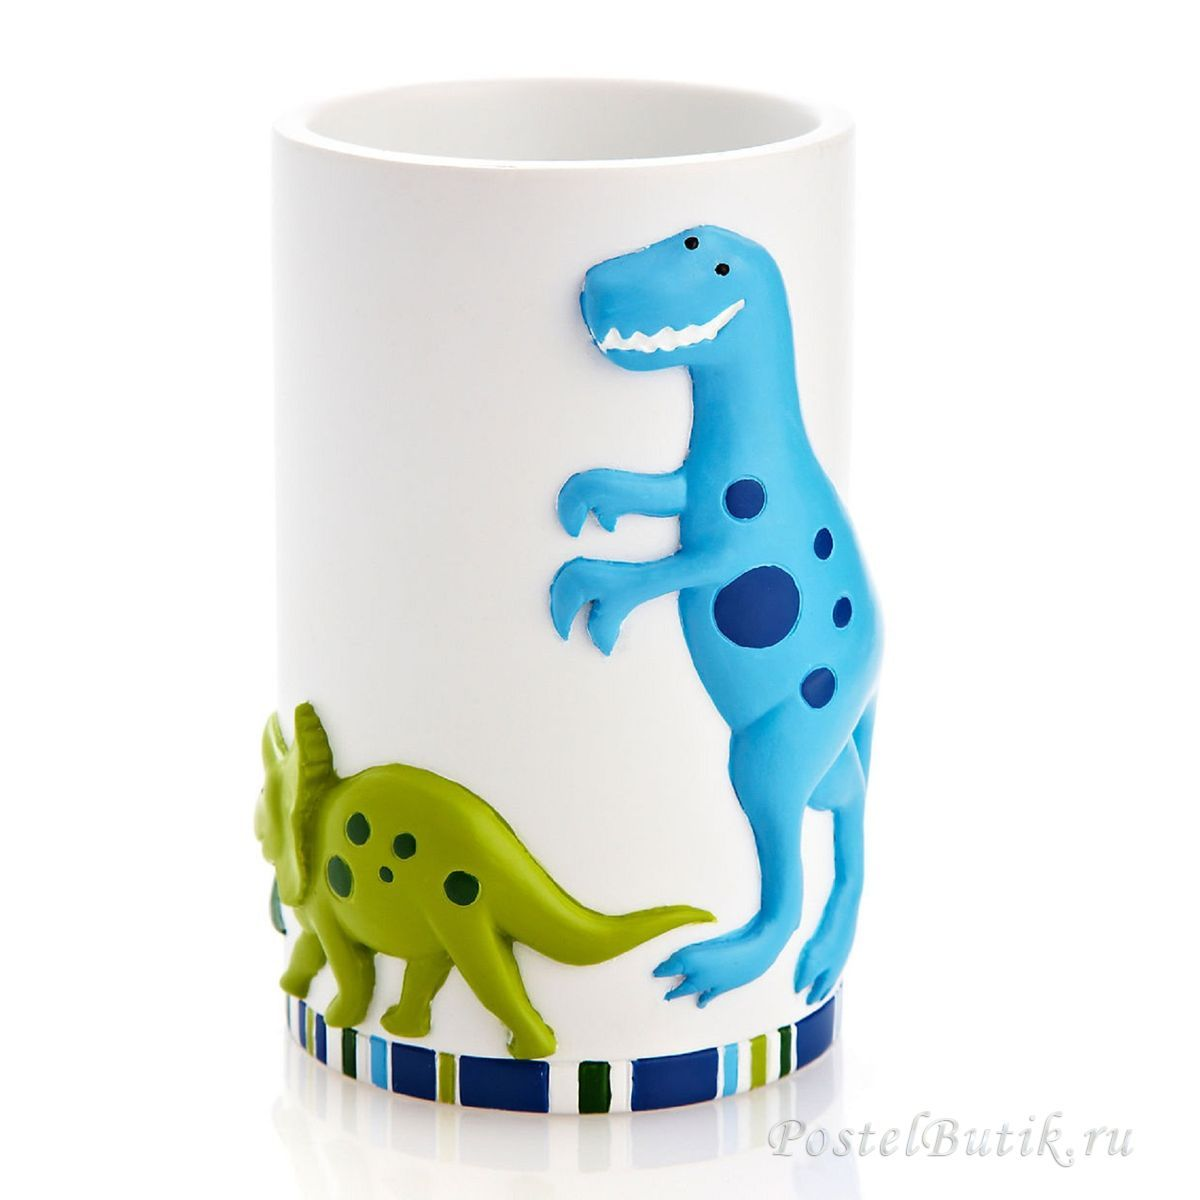 Детские стаканы для зубной пасты Стакан для зубной пасты детский Kassatex Dino Park stakan-dlya-zubnoy-pasty-dino-park-ot-kassatex-ssha-kitay.jpg